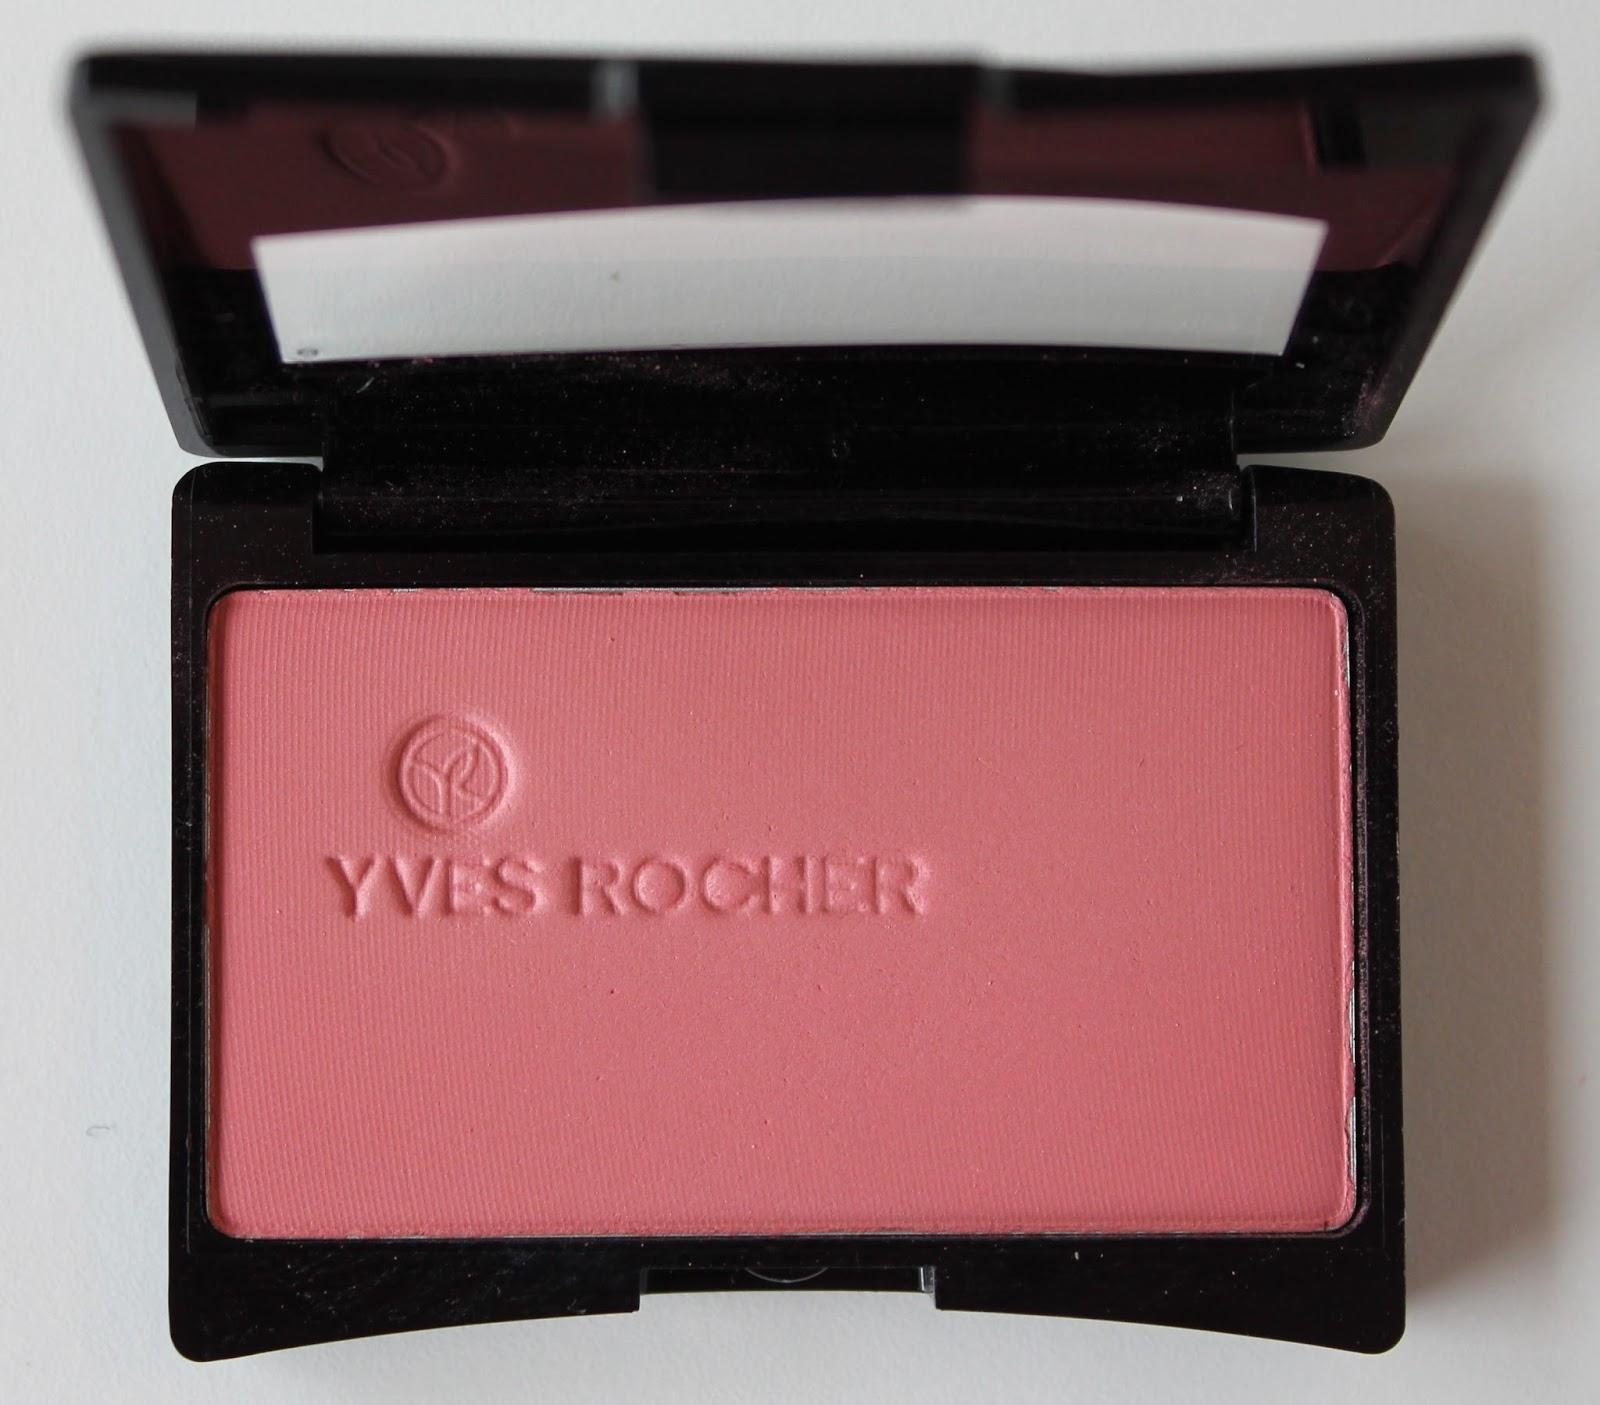 Blush 221 Teint médium abricoté Yves Rocher